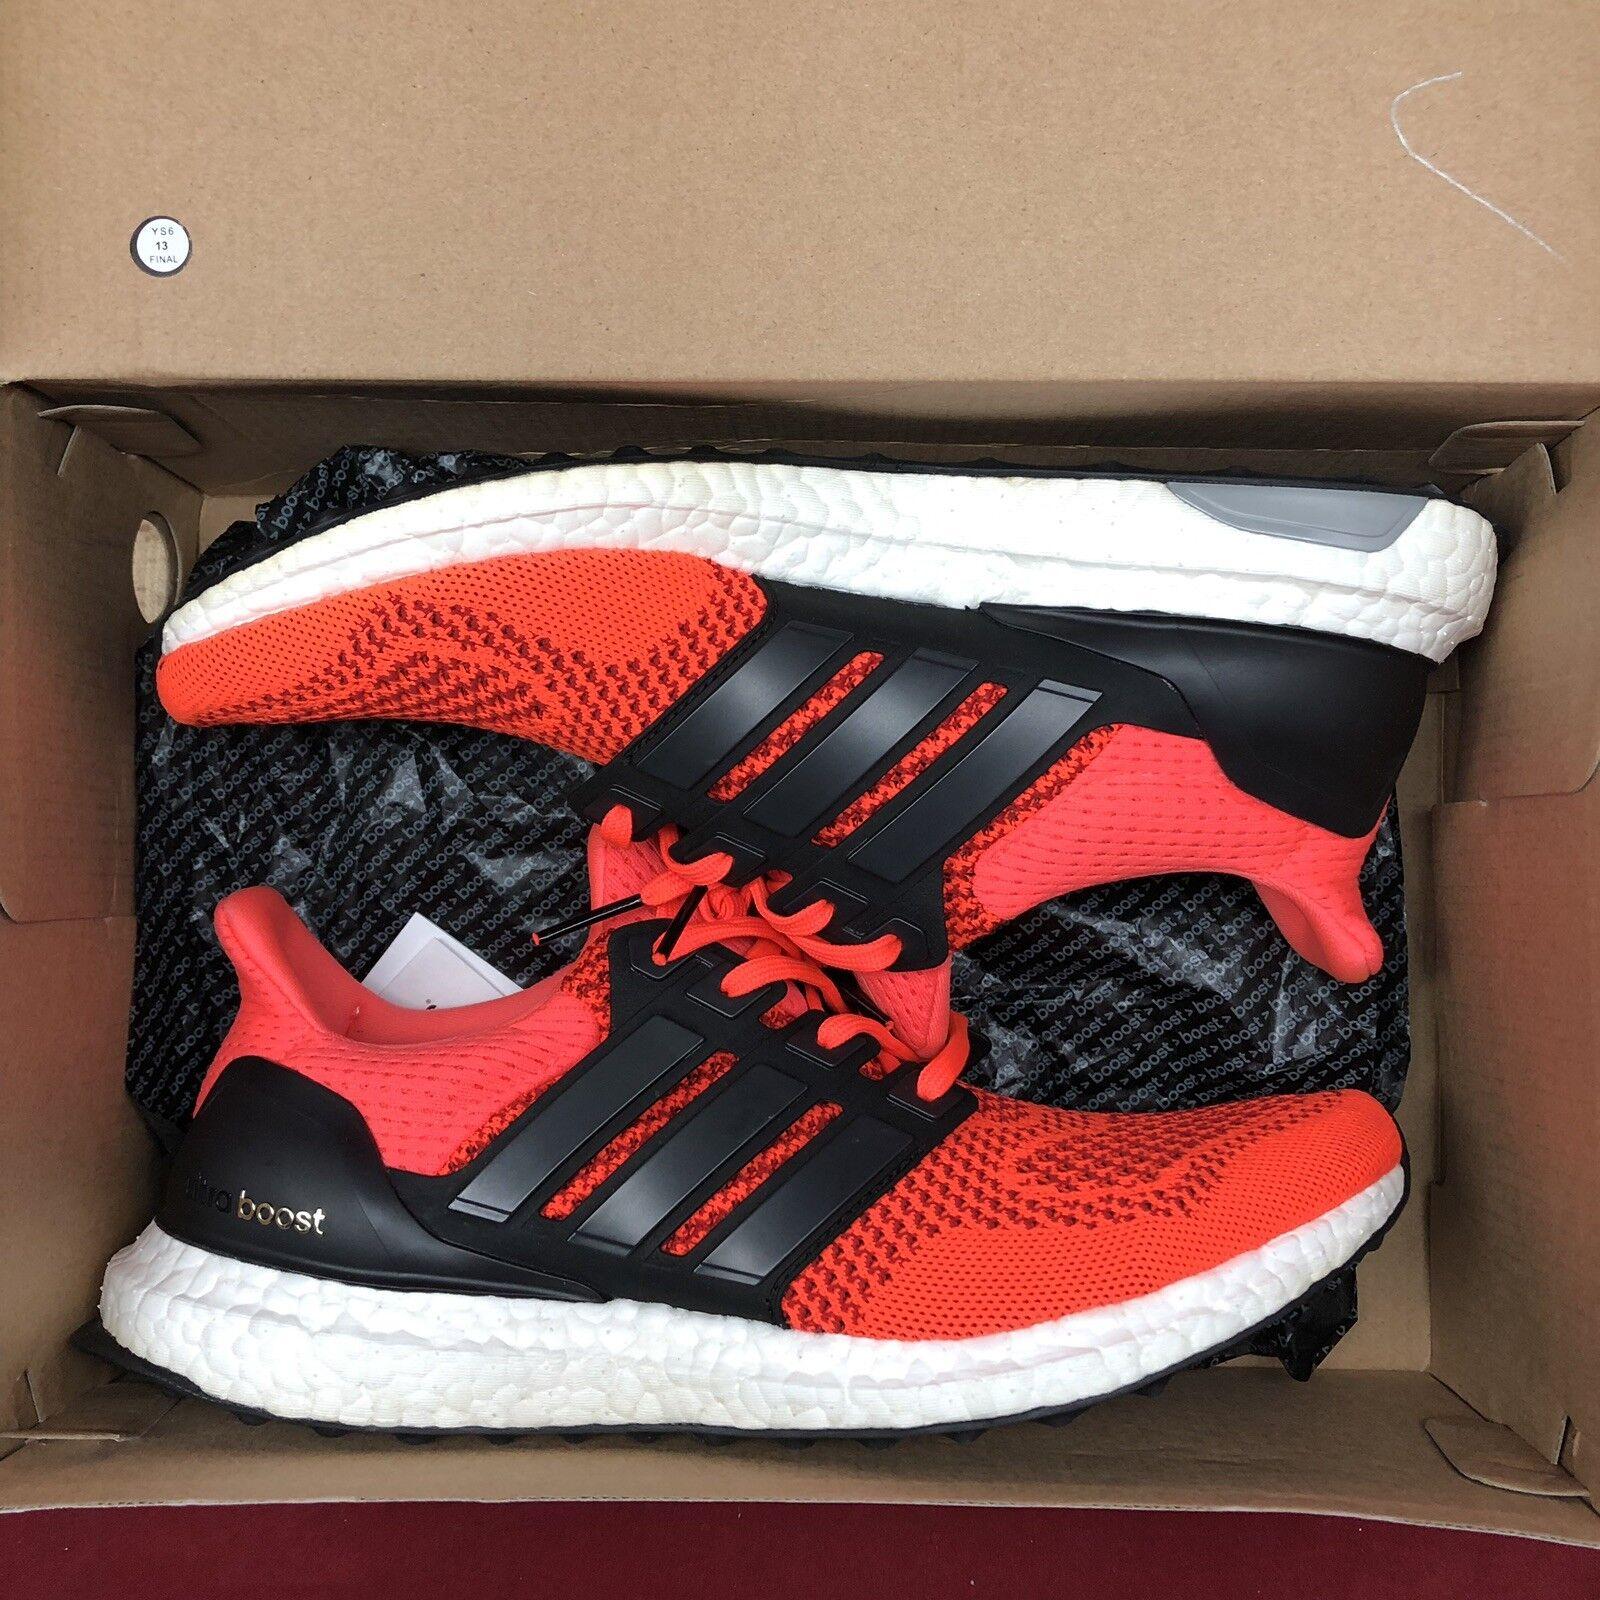 Adidas Originals Ultraboost 1.0 Solar Red Neon Size 9 B34050 Yeezy Boost